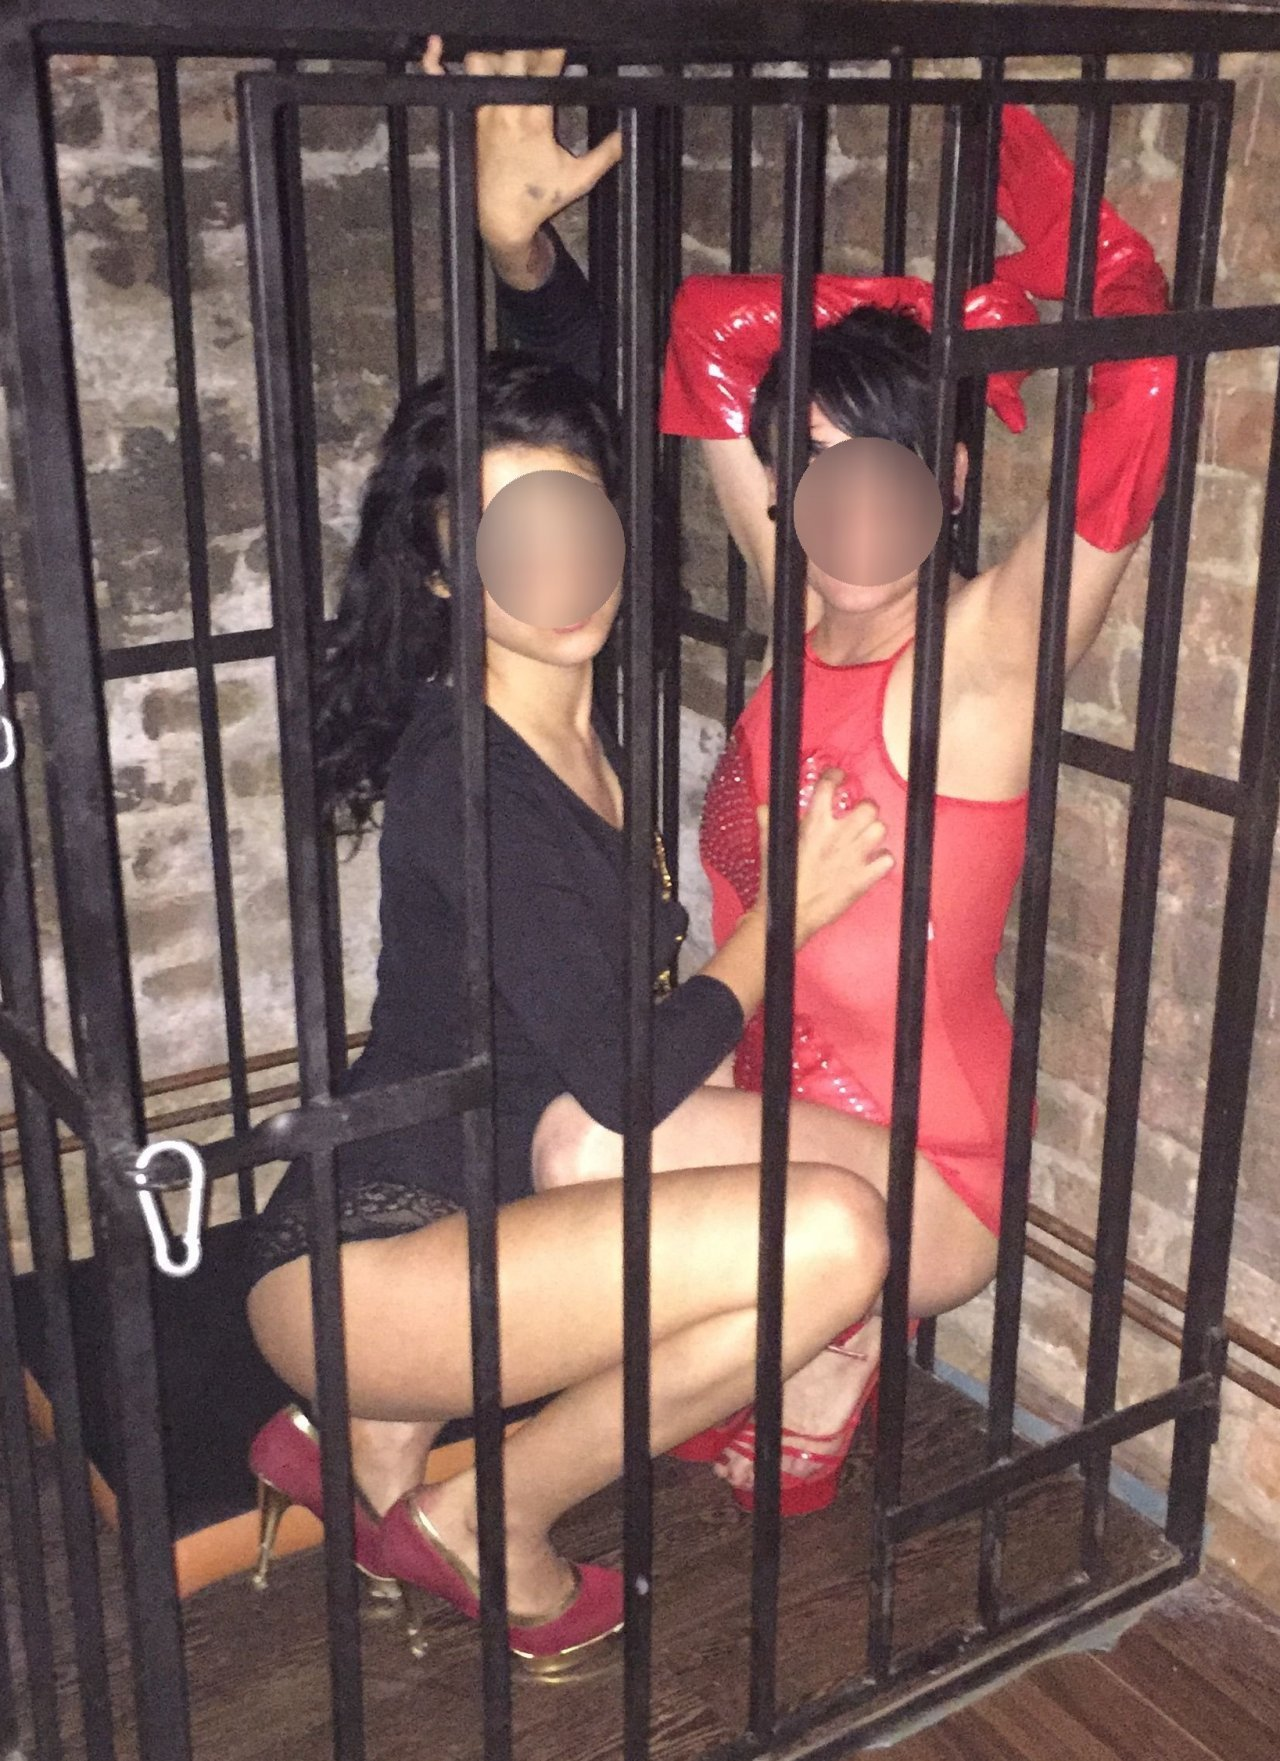 erotika seznamka erotické masáže praha